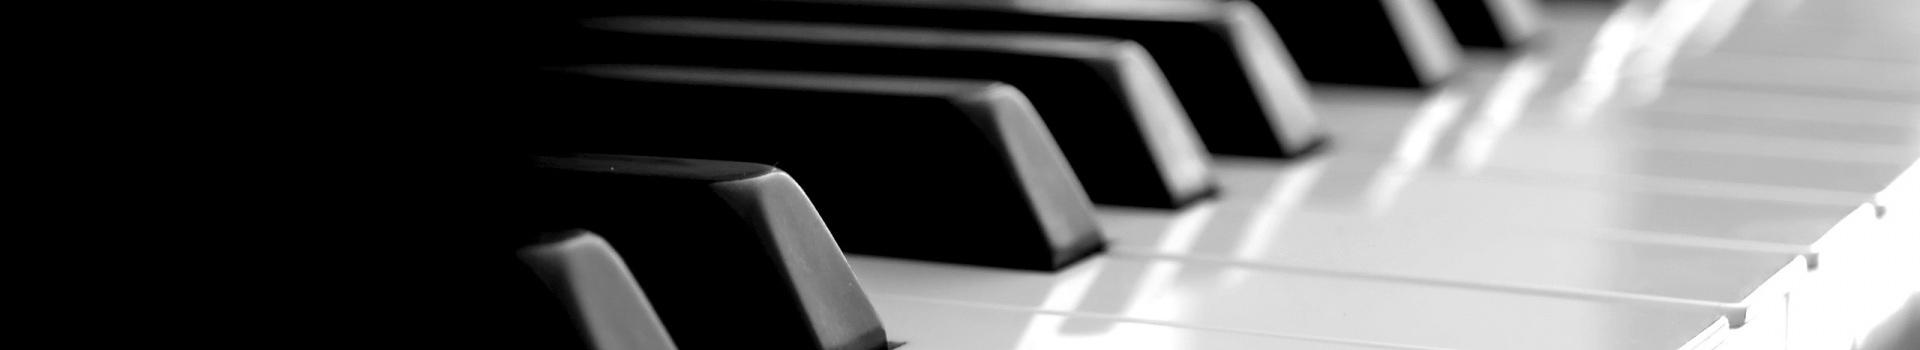 piano-slide1